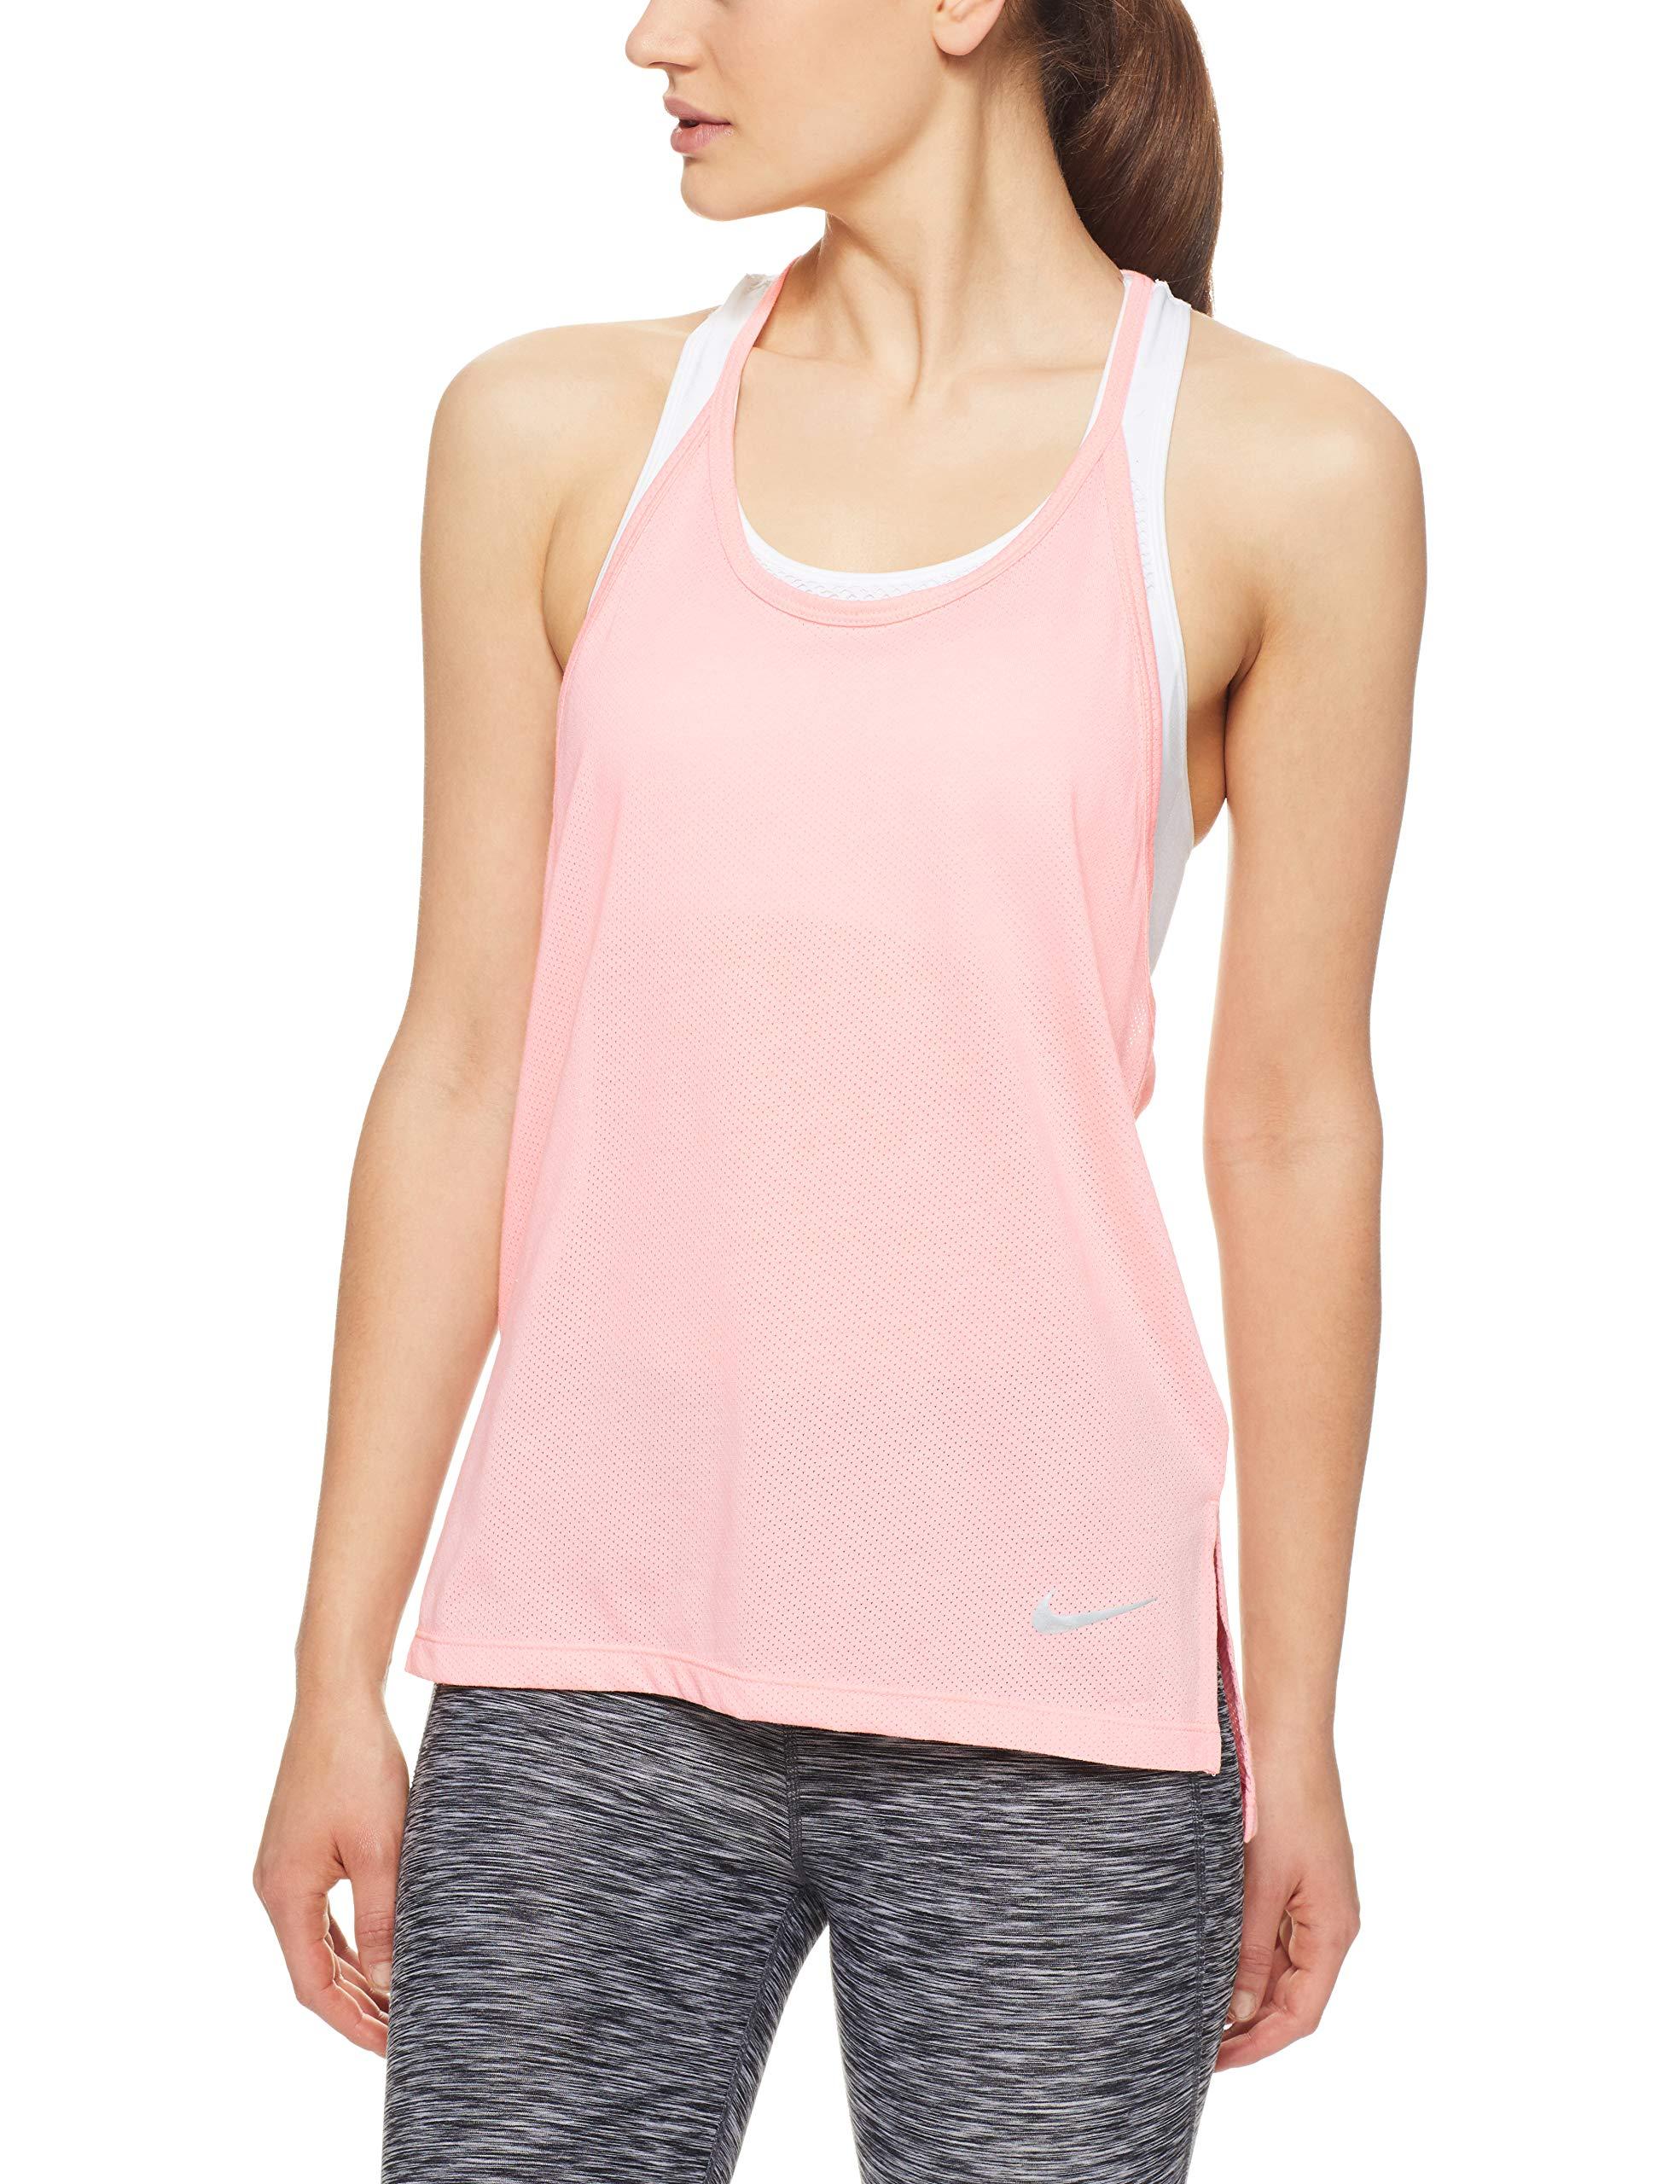 Nike Women's Tailwind Cool LX Tank Top Storm Pink Large